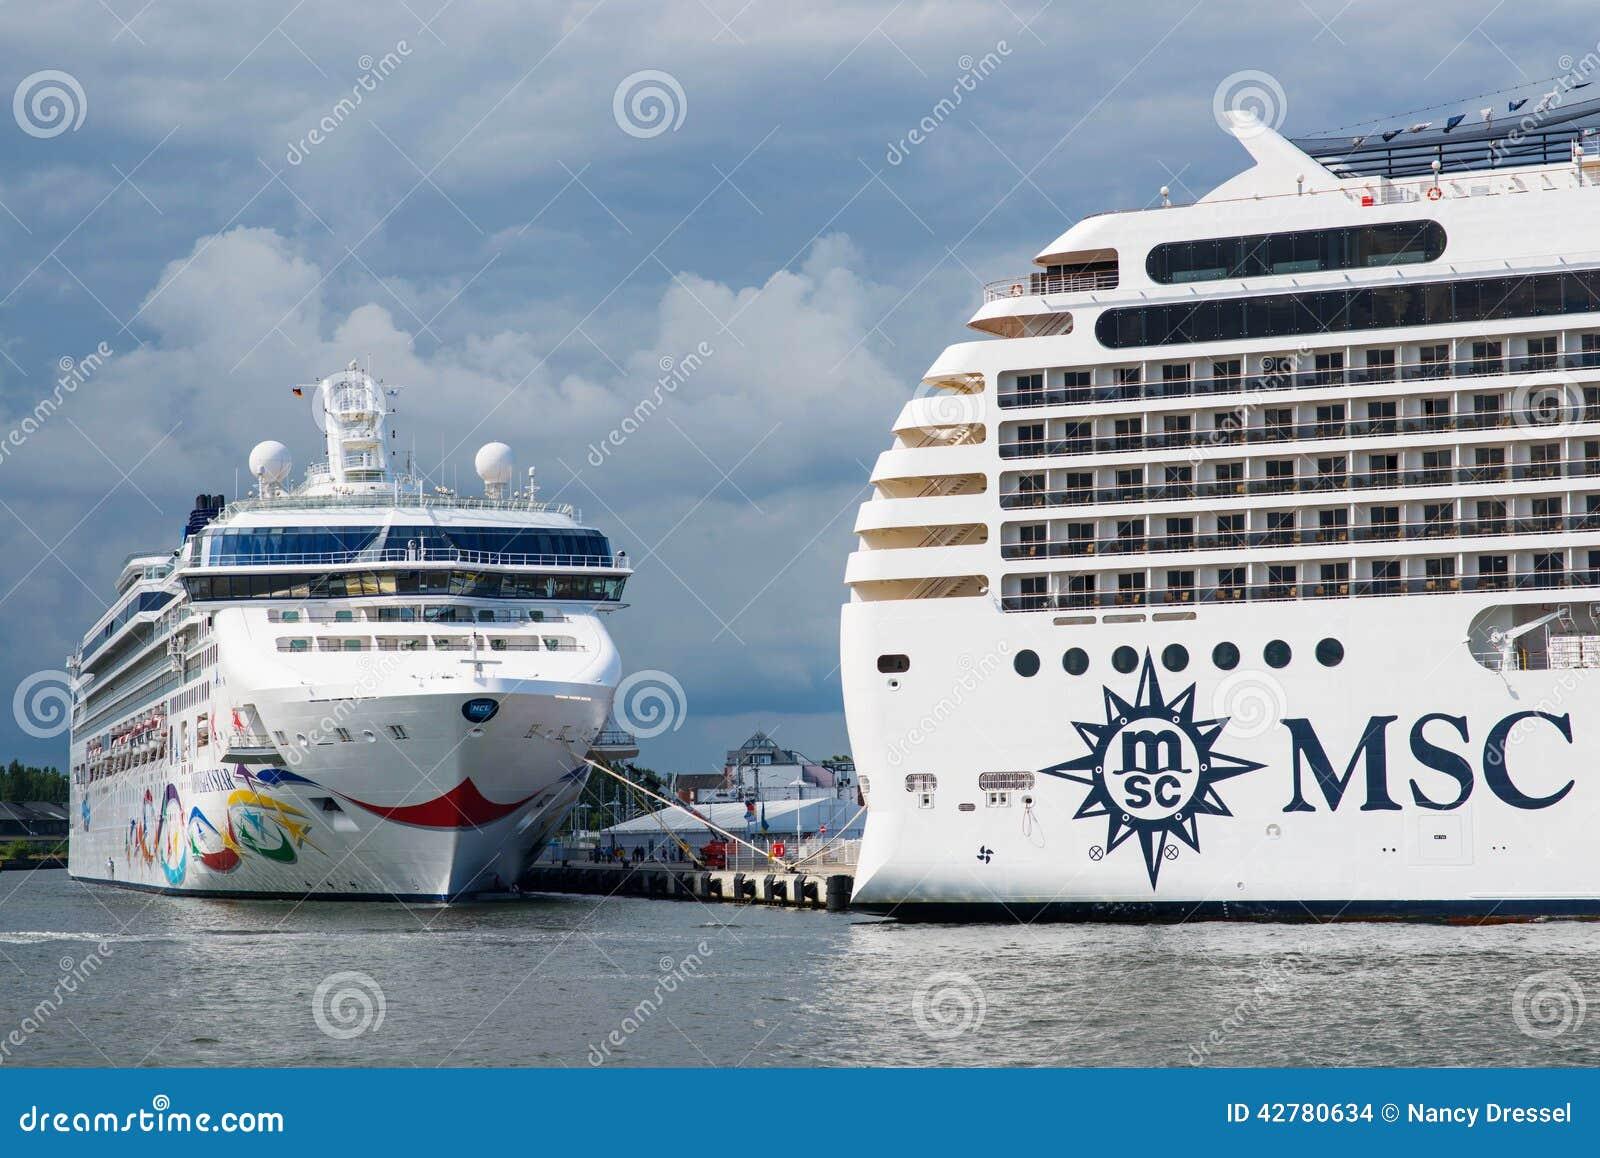 Luxury cruise ships MSC Poesia and Norwegian Star